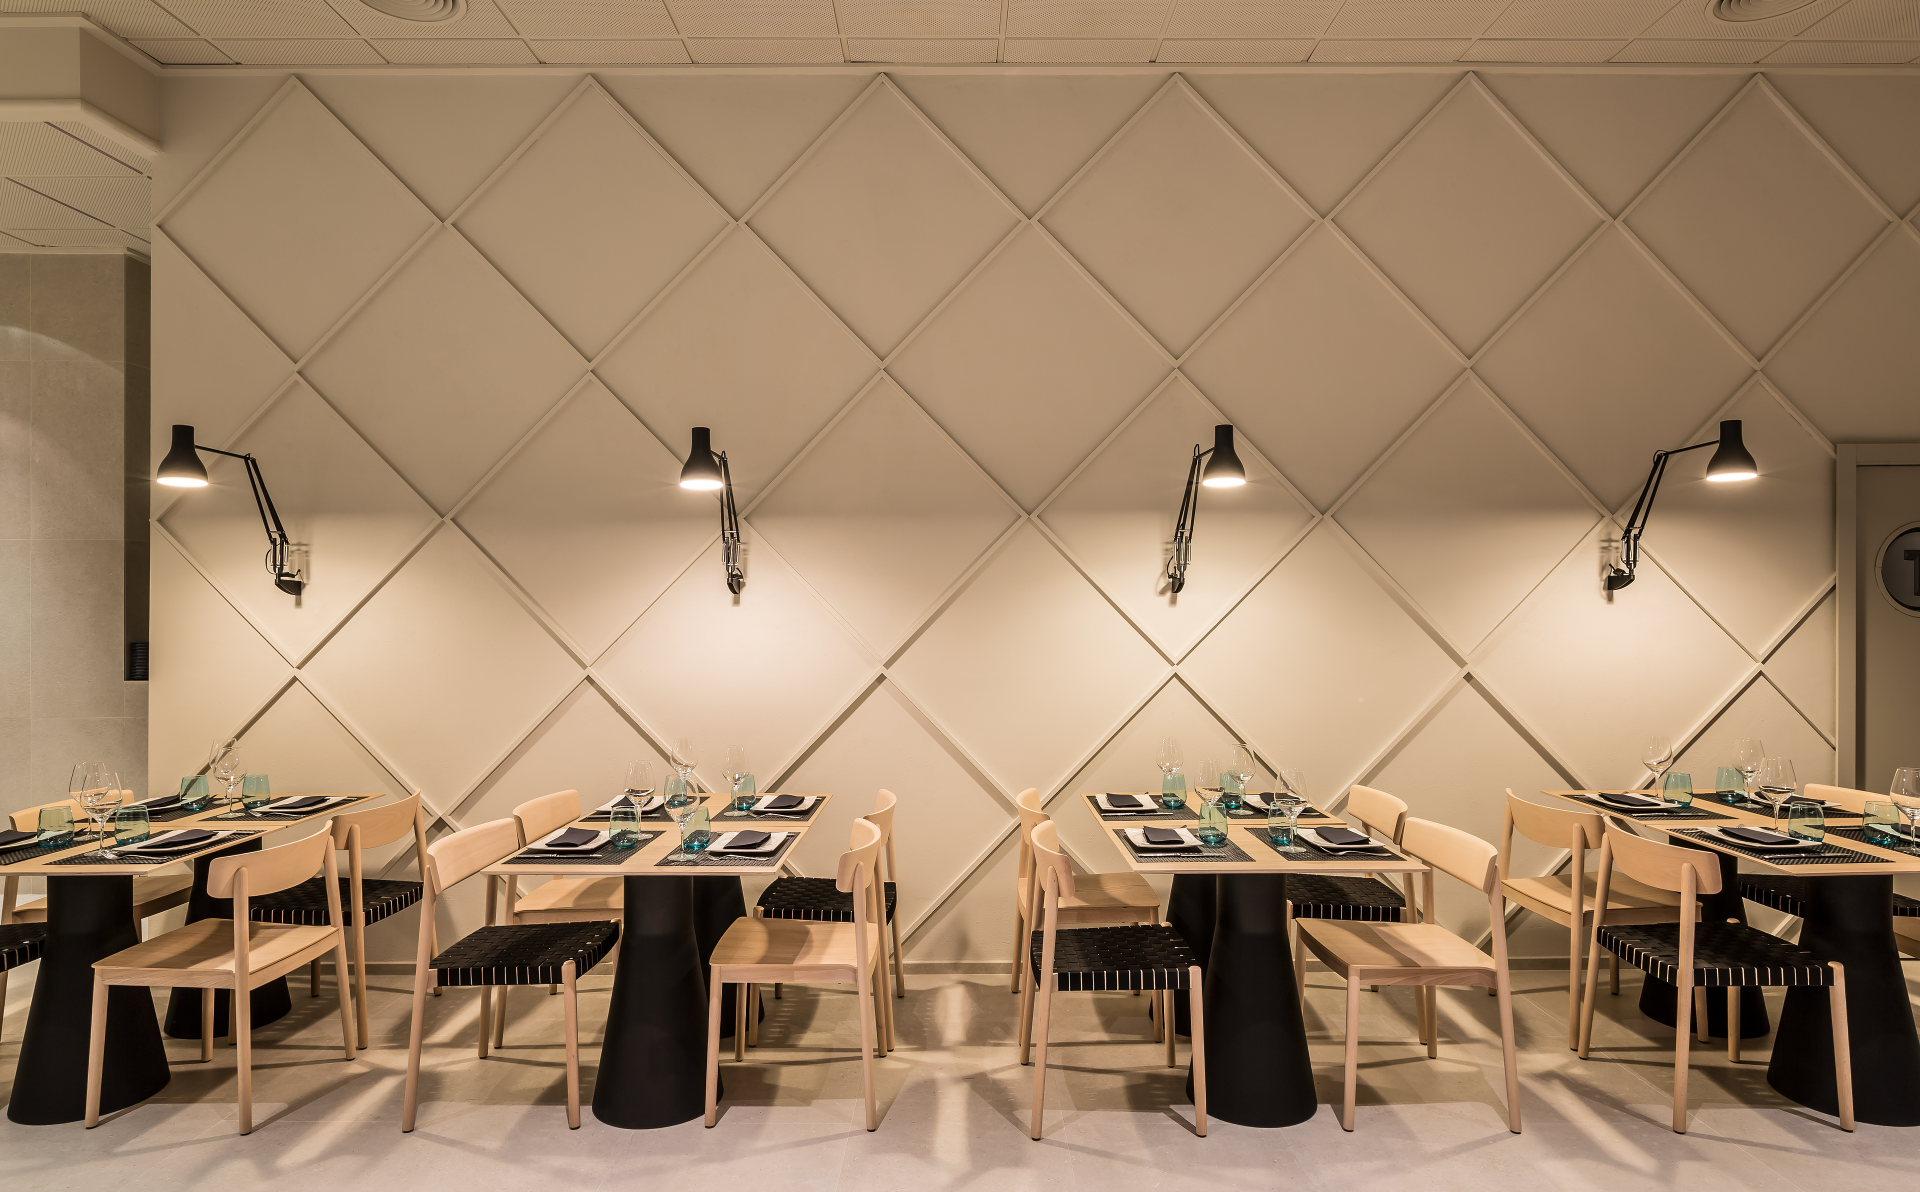 fotografia-arquitectura–interiorismo-valencia-german-cabo-estudihac-restaurante-tipics-xativa (22)